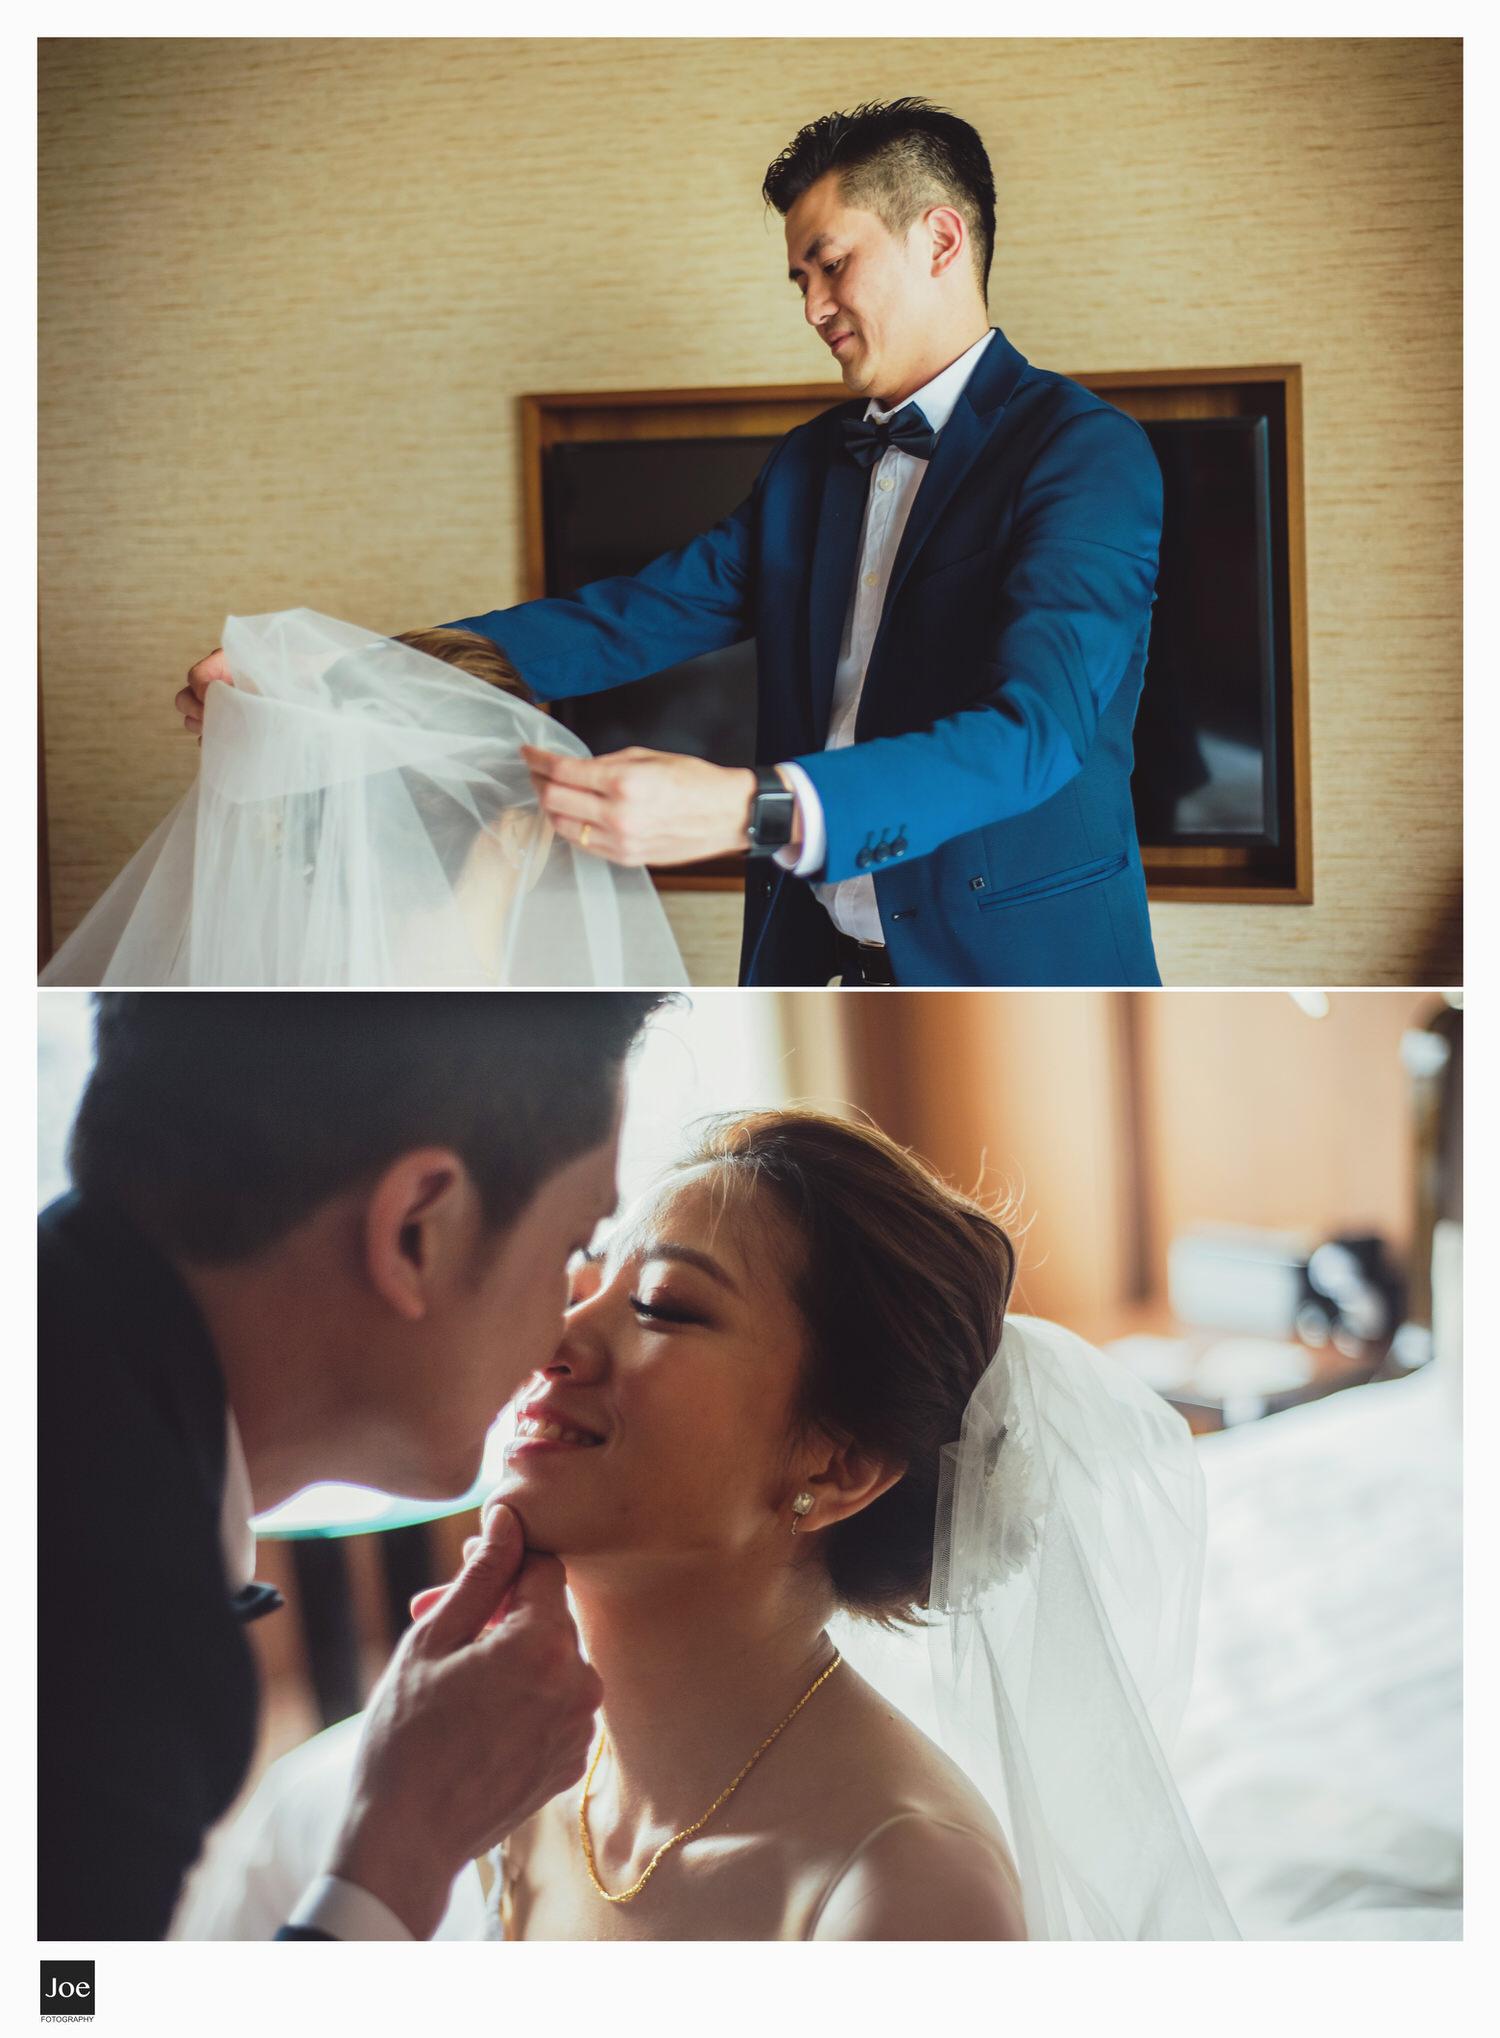 wedding-photography-shangri-la-far-eastern-plaza-hotel-ariel-sam-joe-fotography-093.jpg